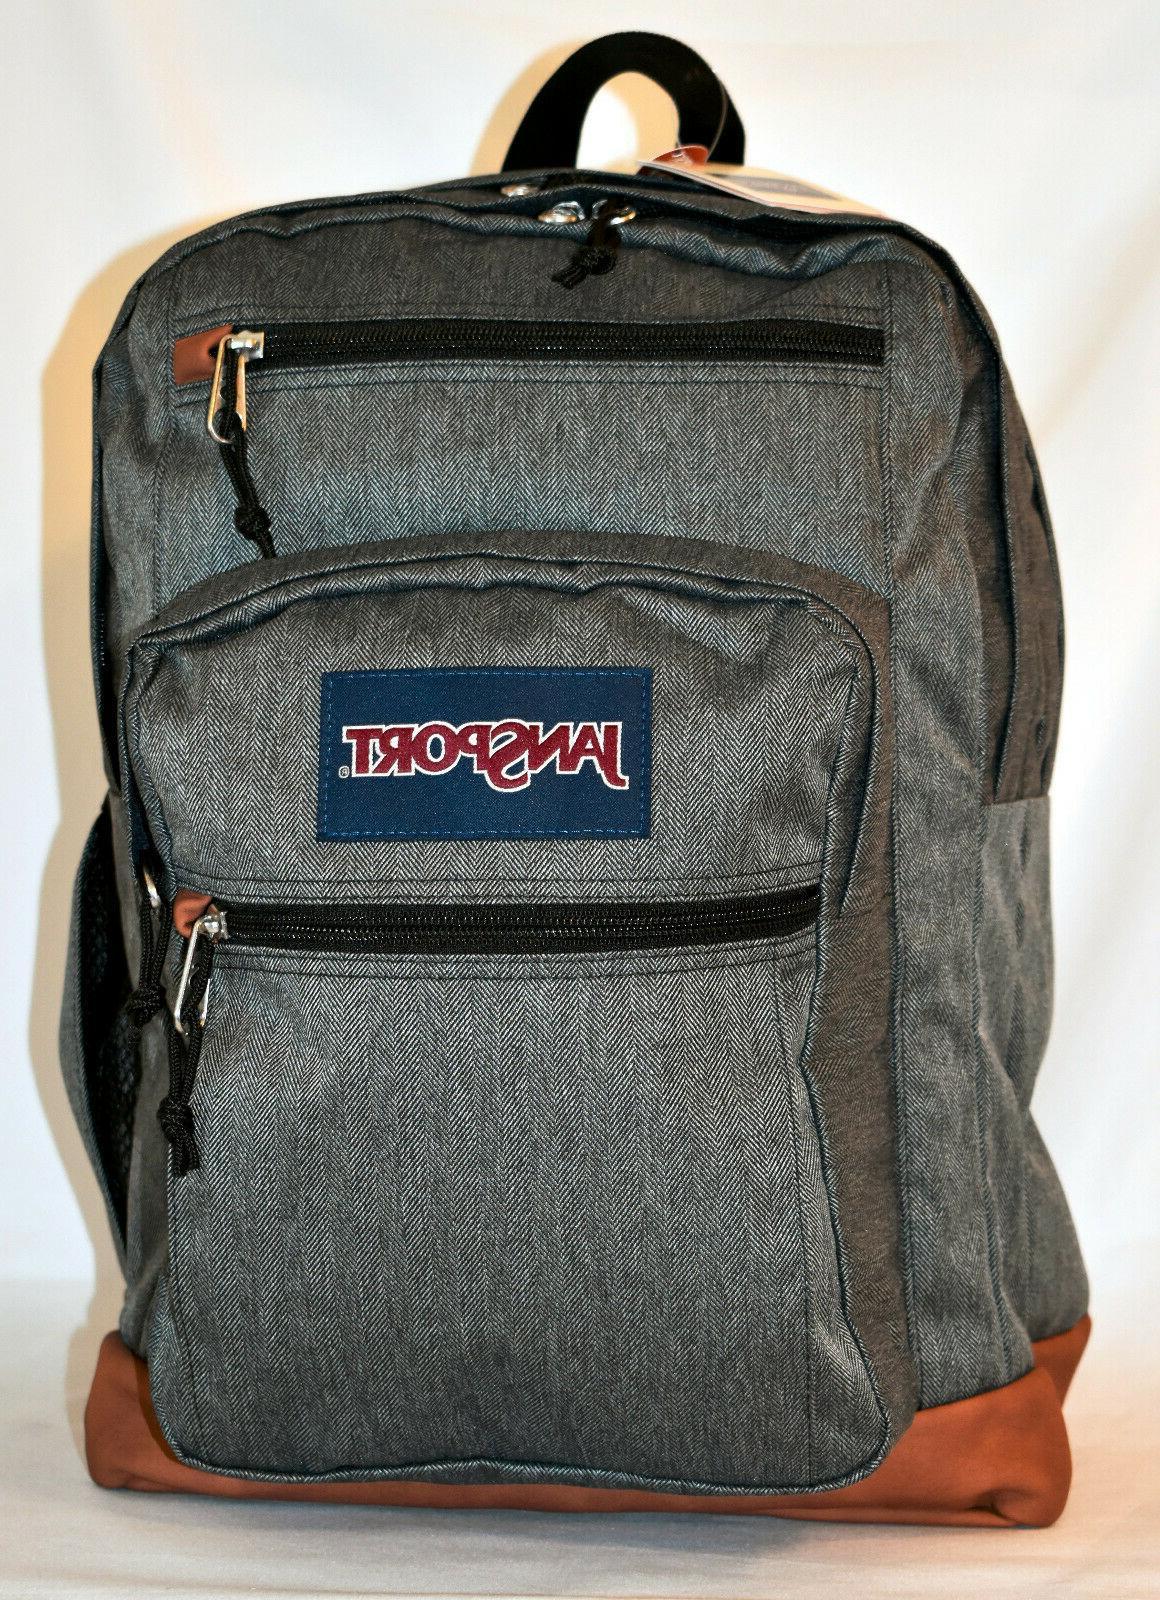 New Laptop Backpack White